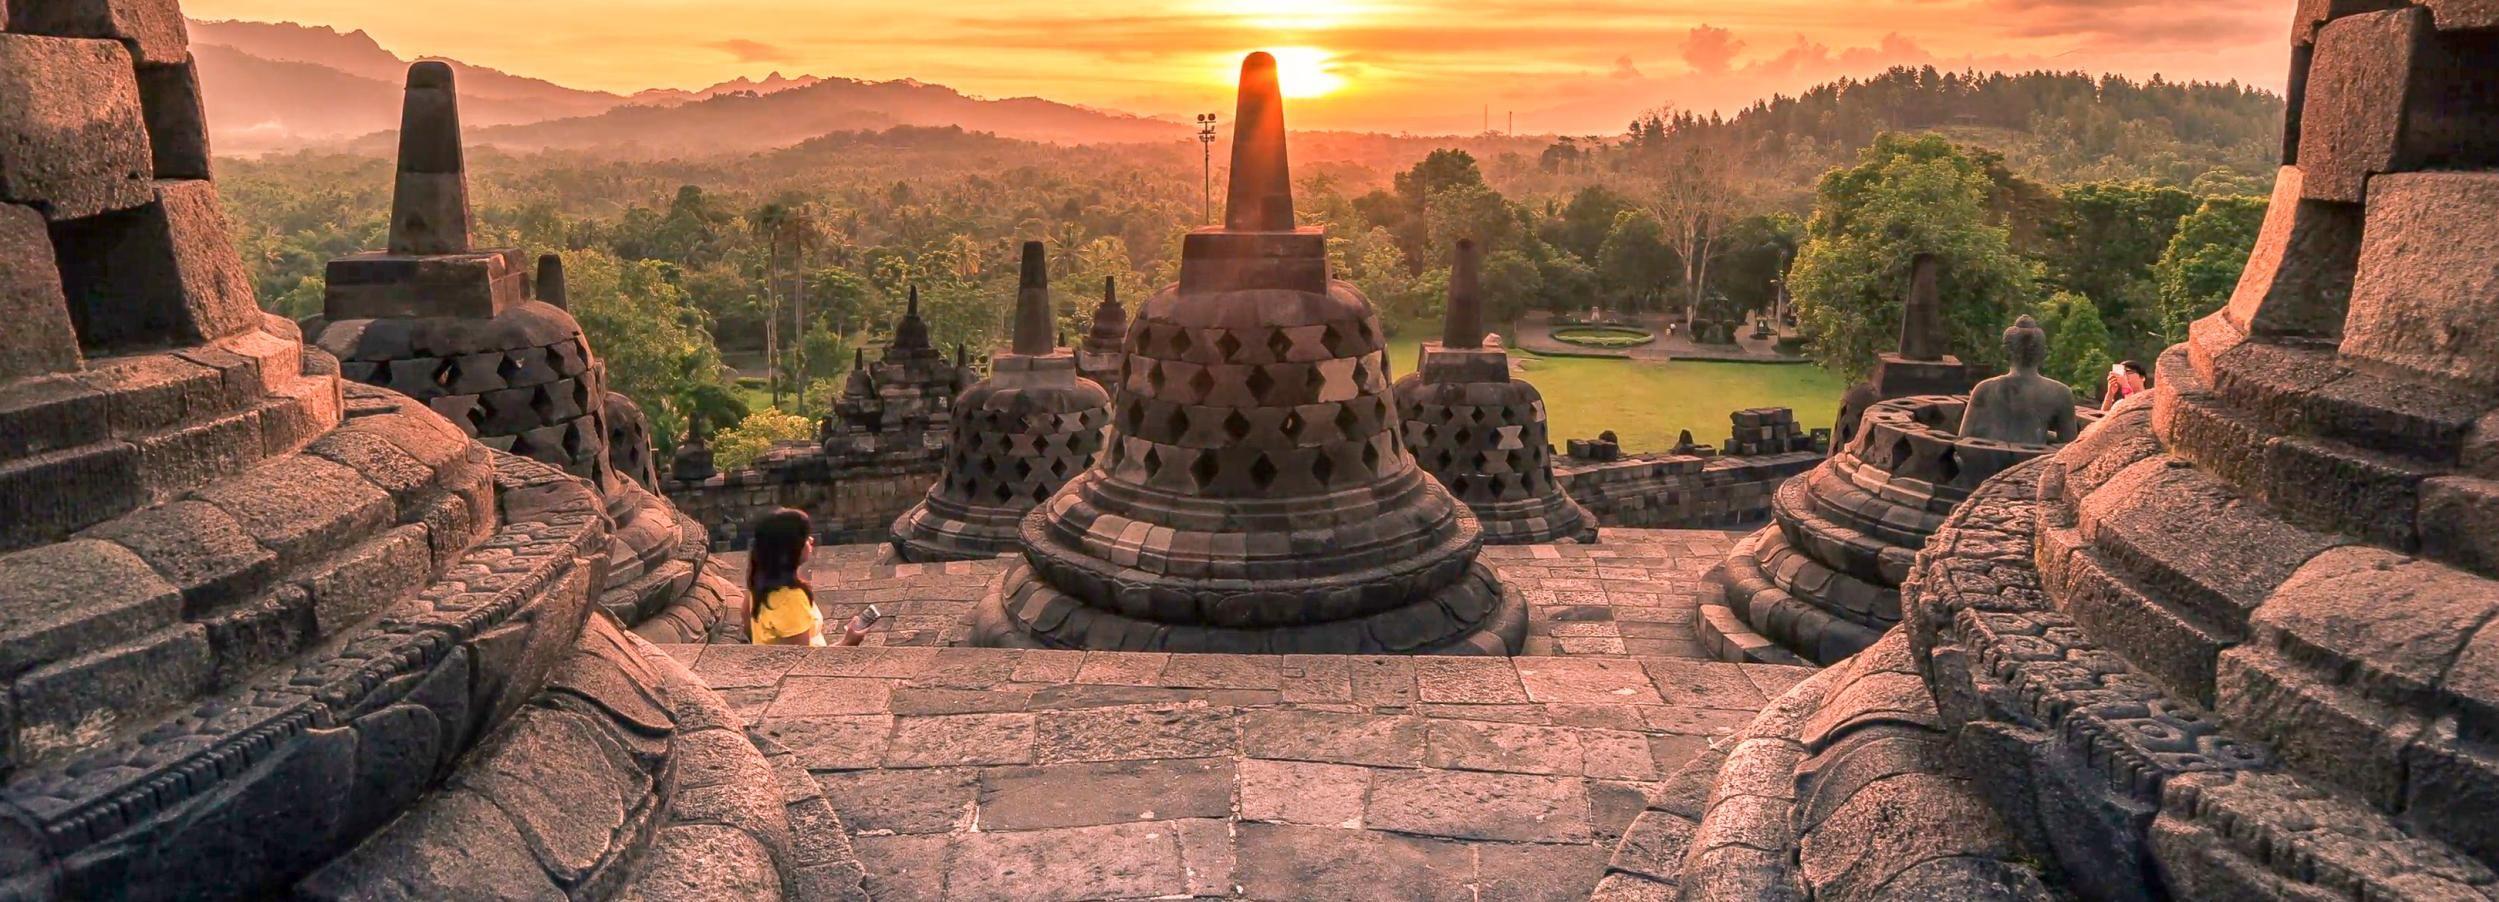 Borobudur Sunrise or Sunset Half Day Private Tour